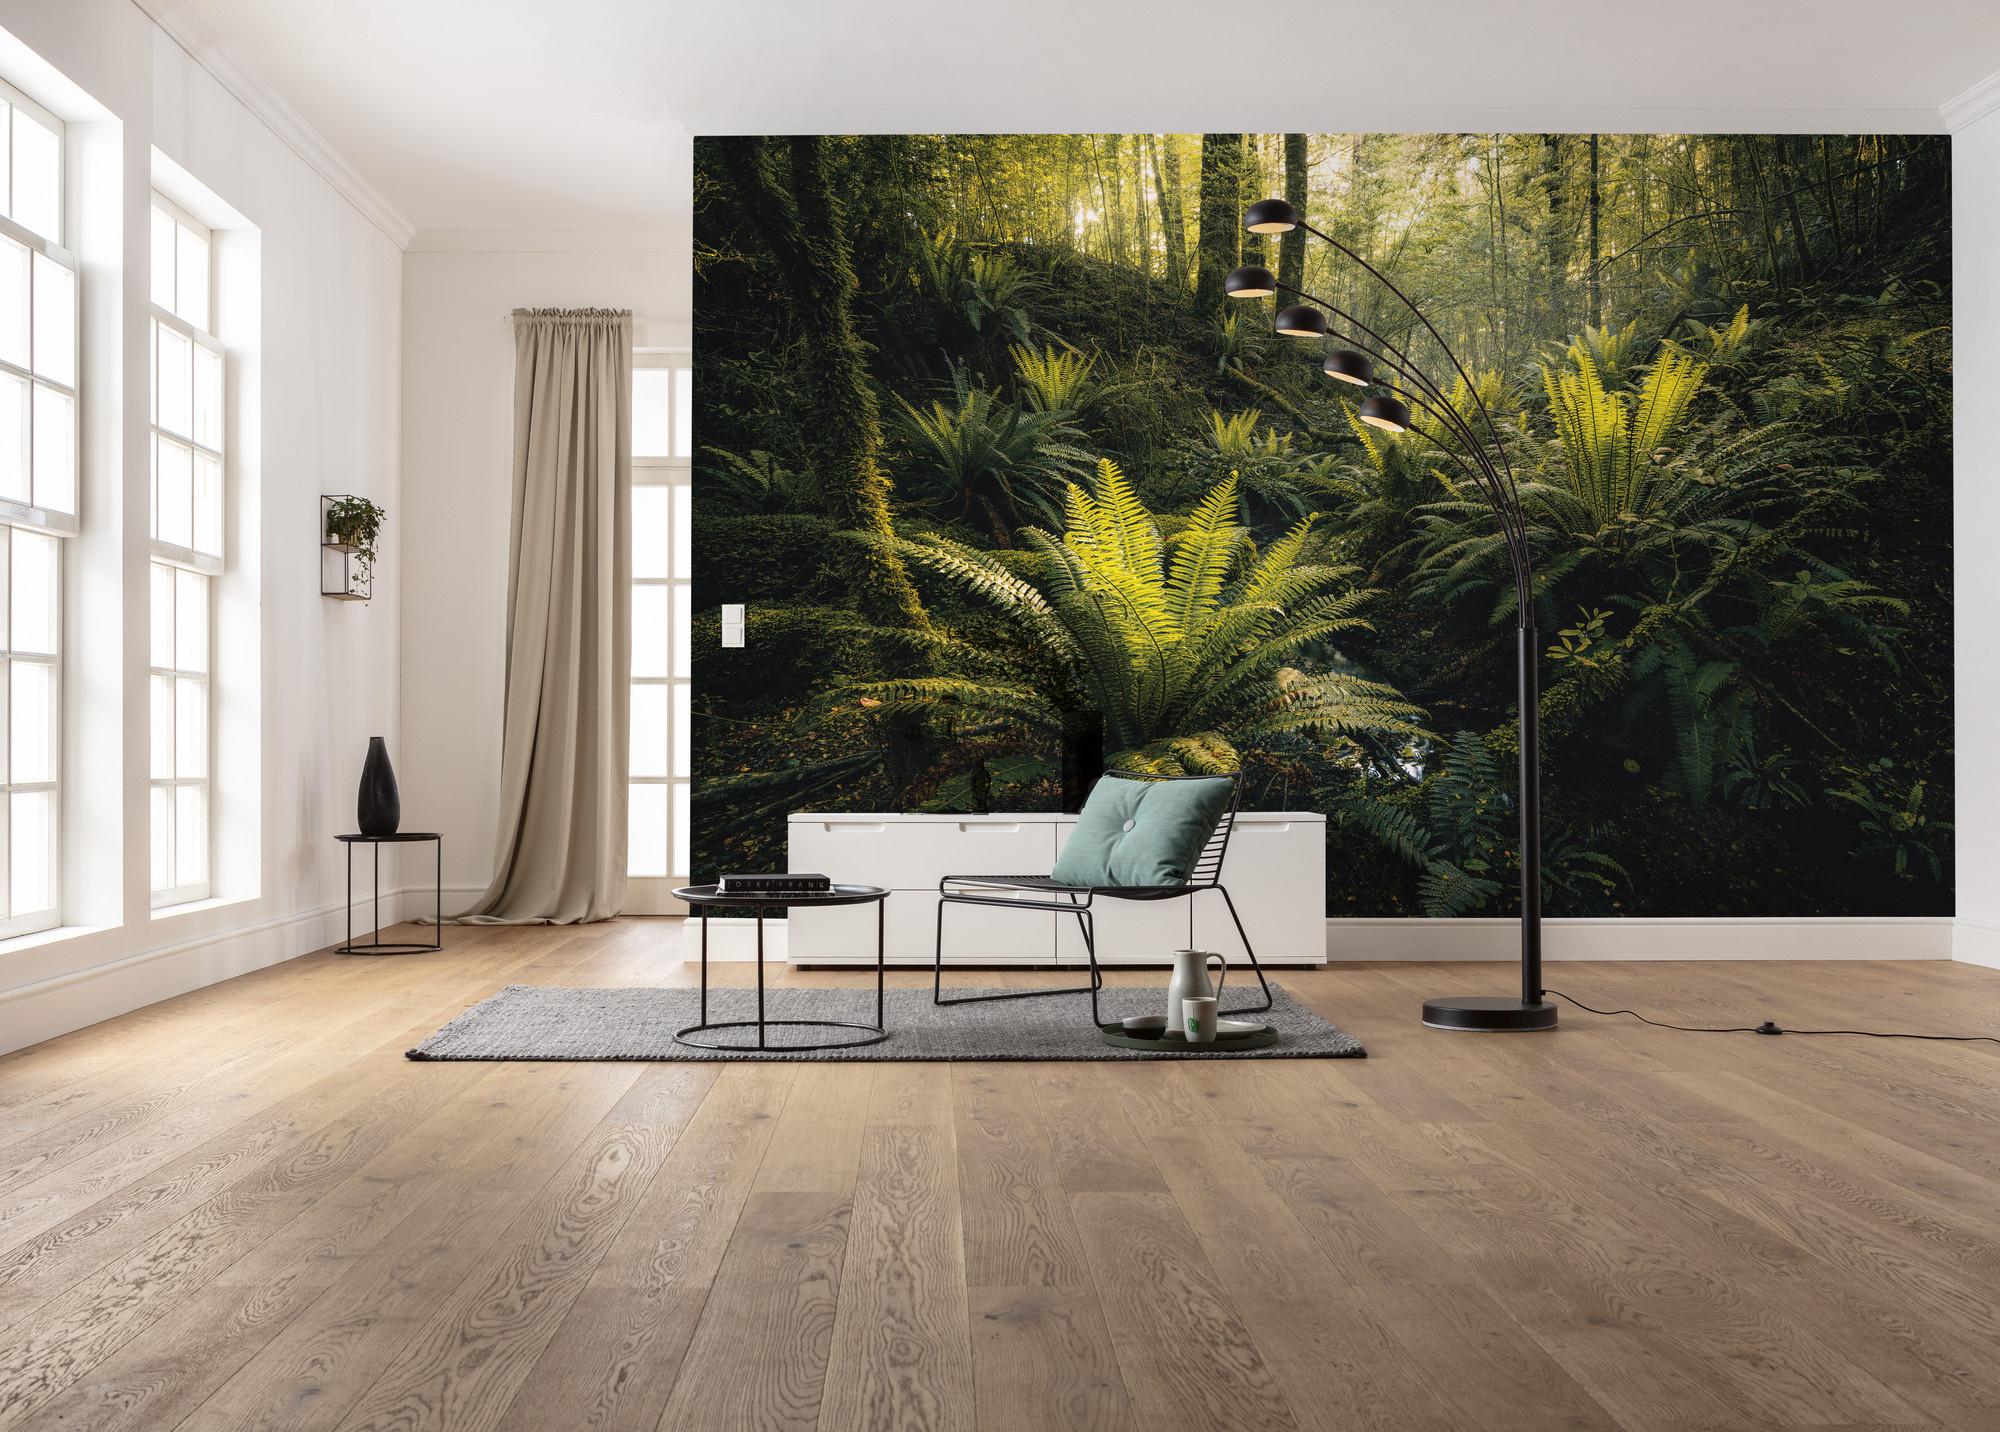 Stefan Hefele Edition 2 Fotobehang Komar - Natuur behang FJORDLAND WOODS